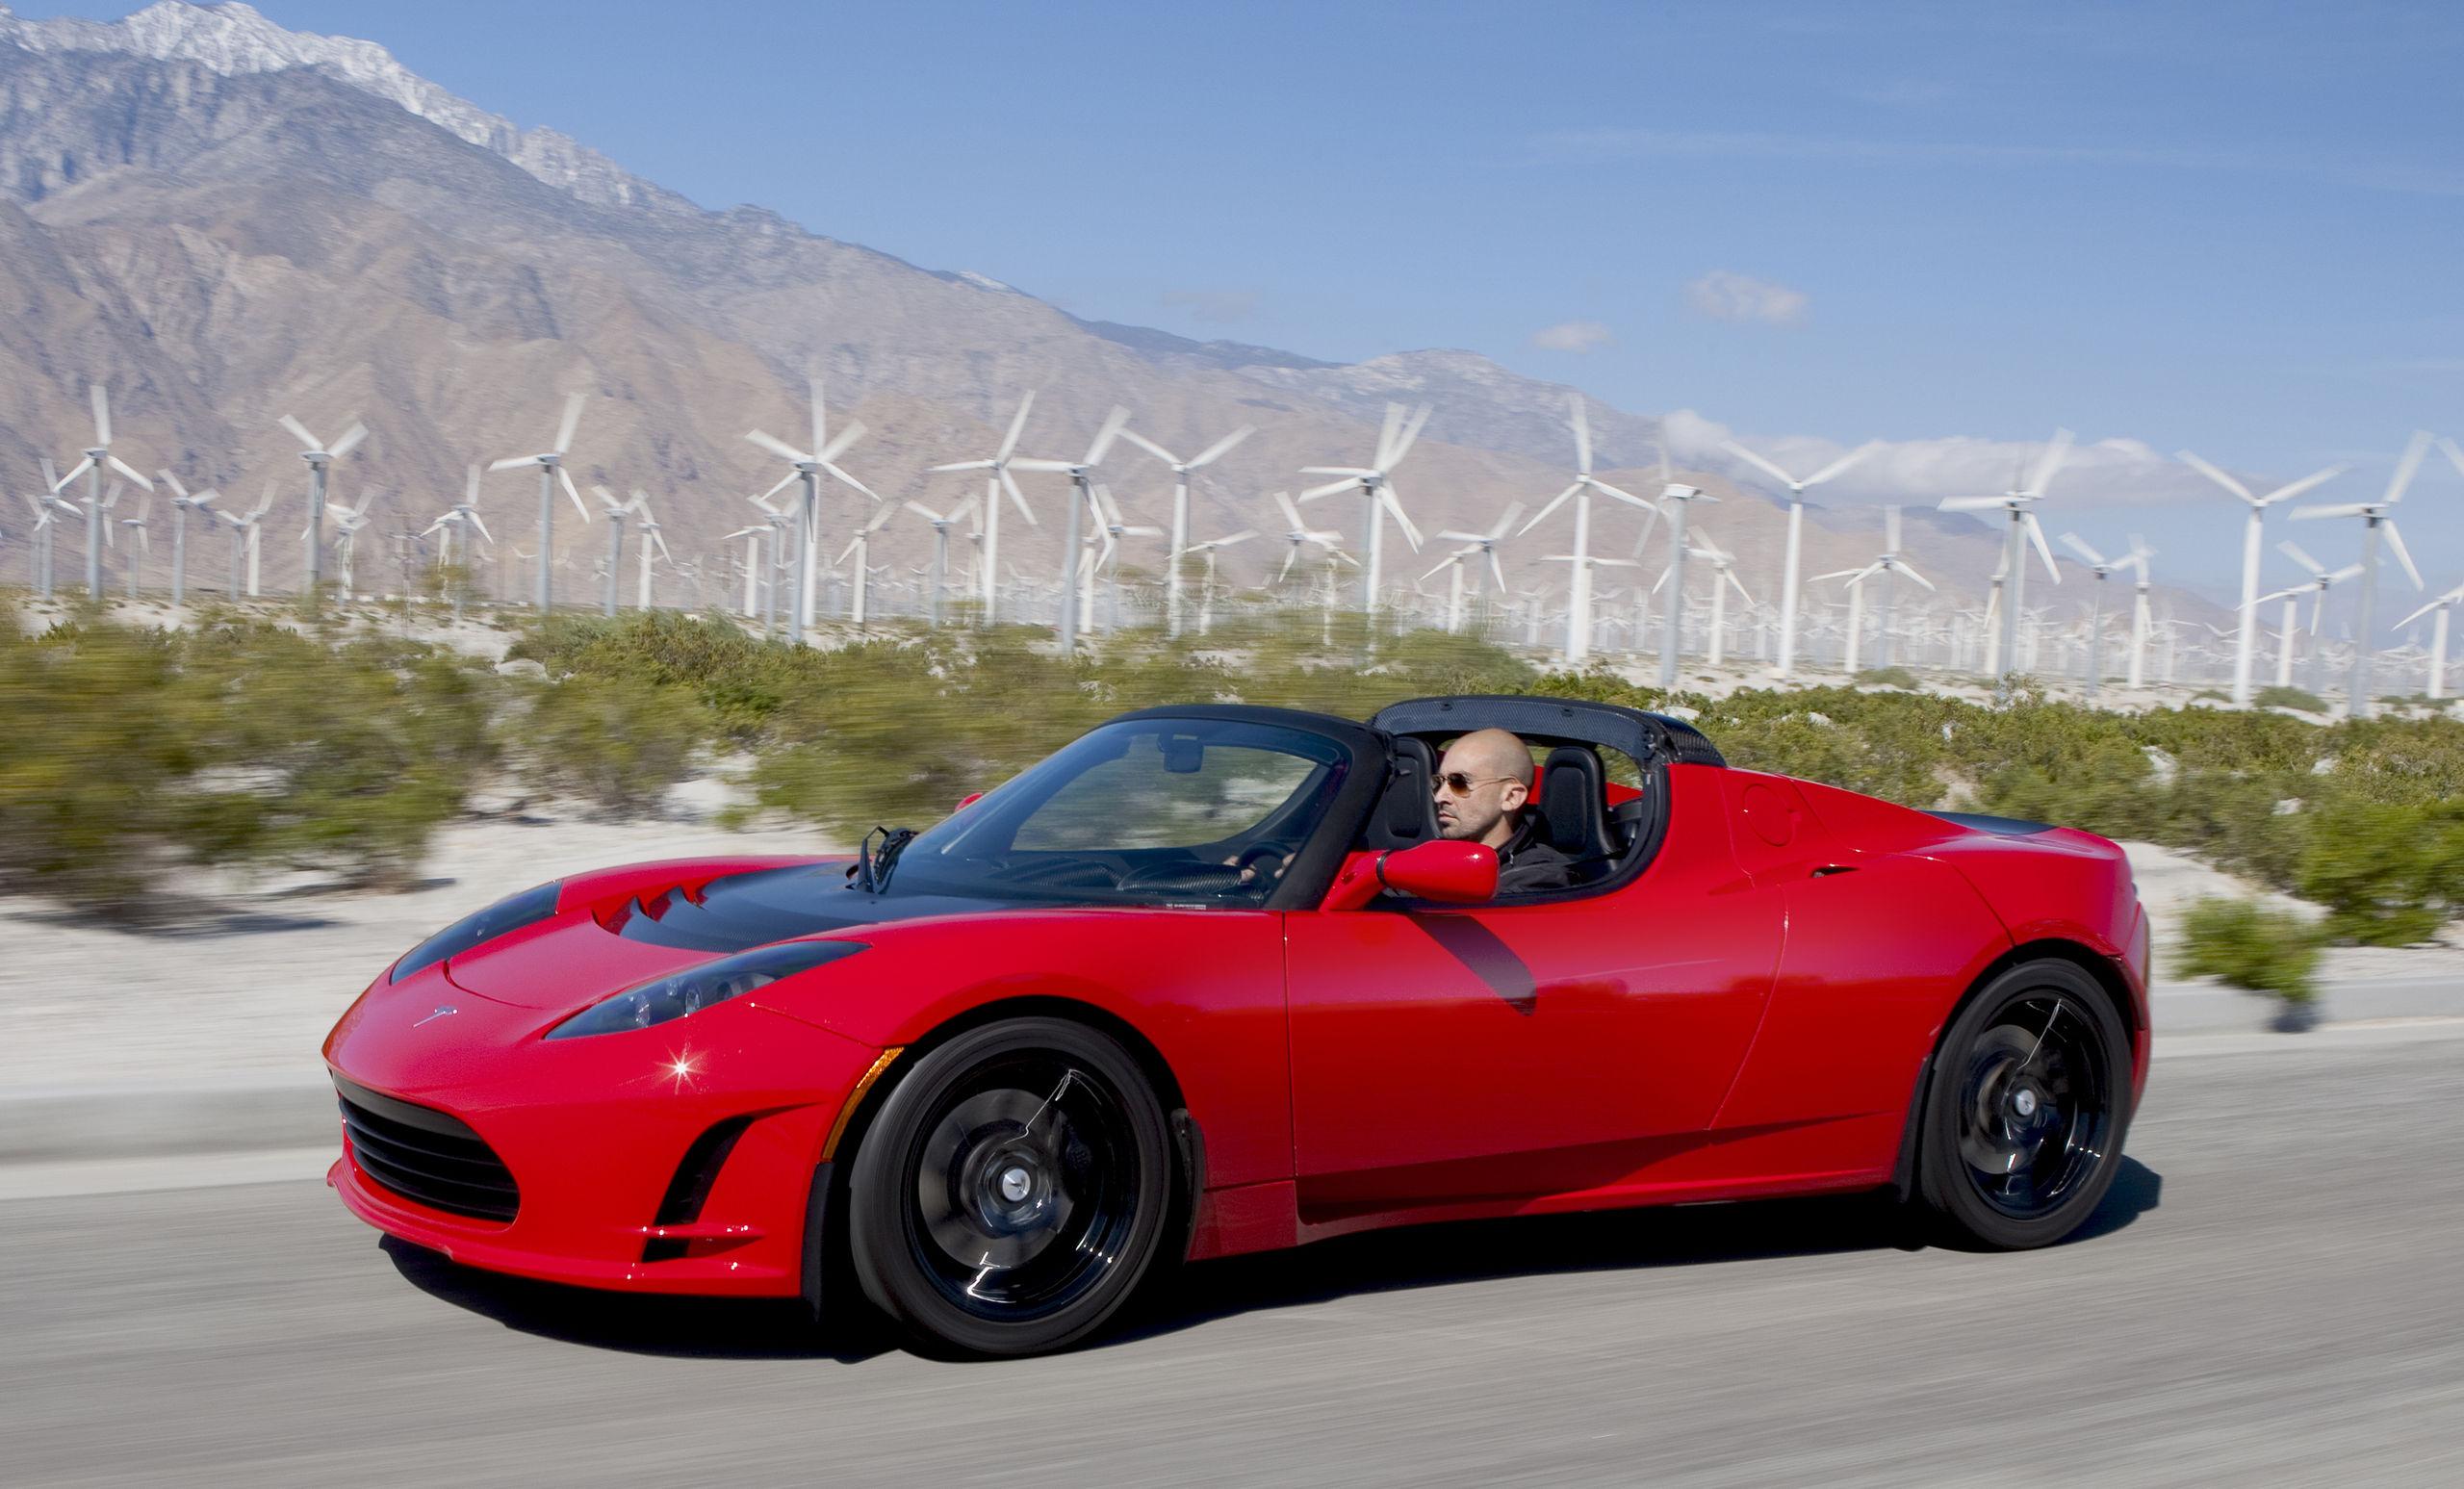 Best technology news in weeks: Electric car maker Tesla